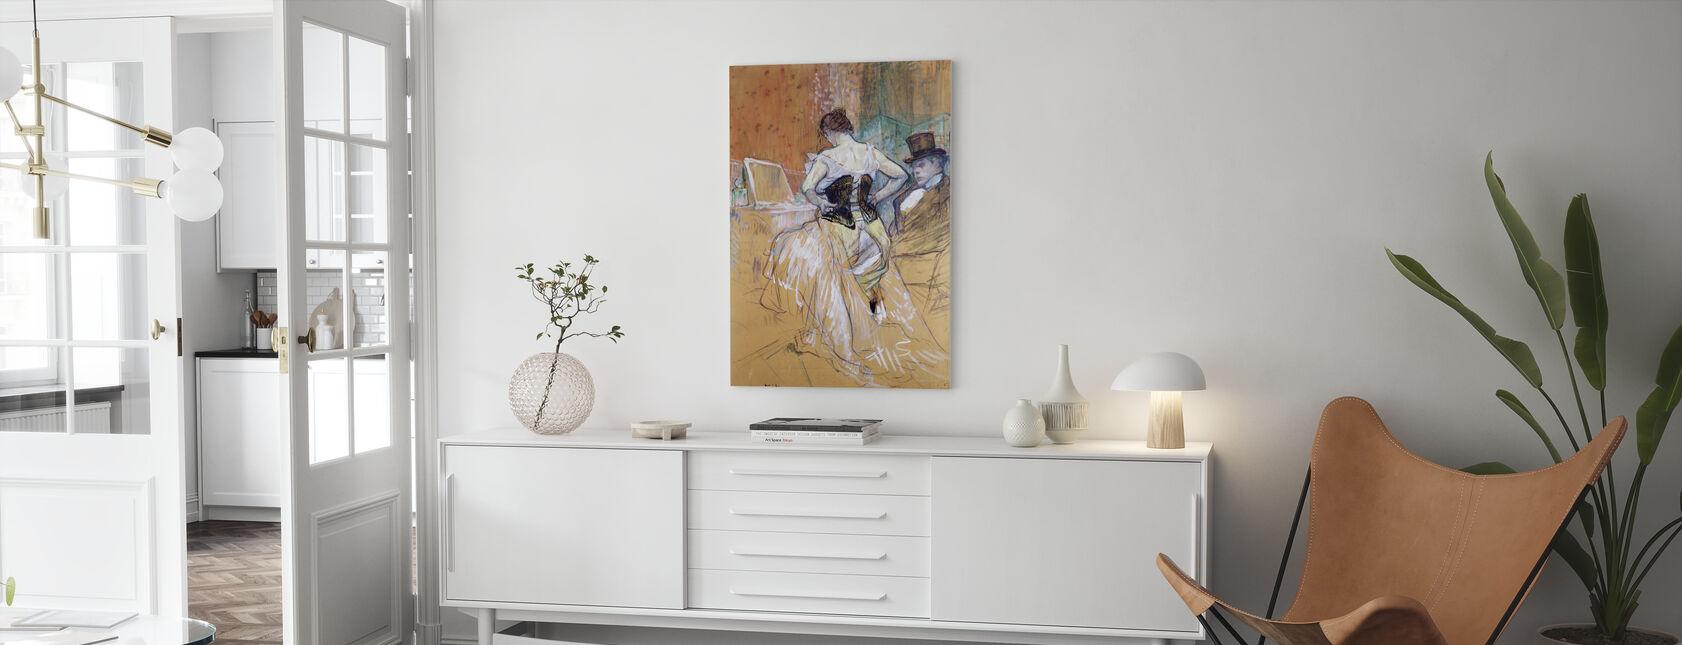 Women at her Toilet, Henri Toulouse Lautrec - Canvas print - Living Room